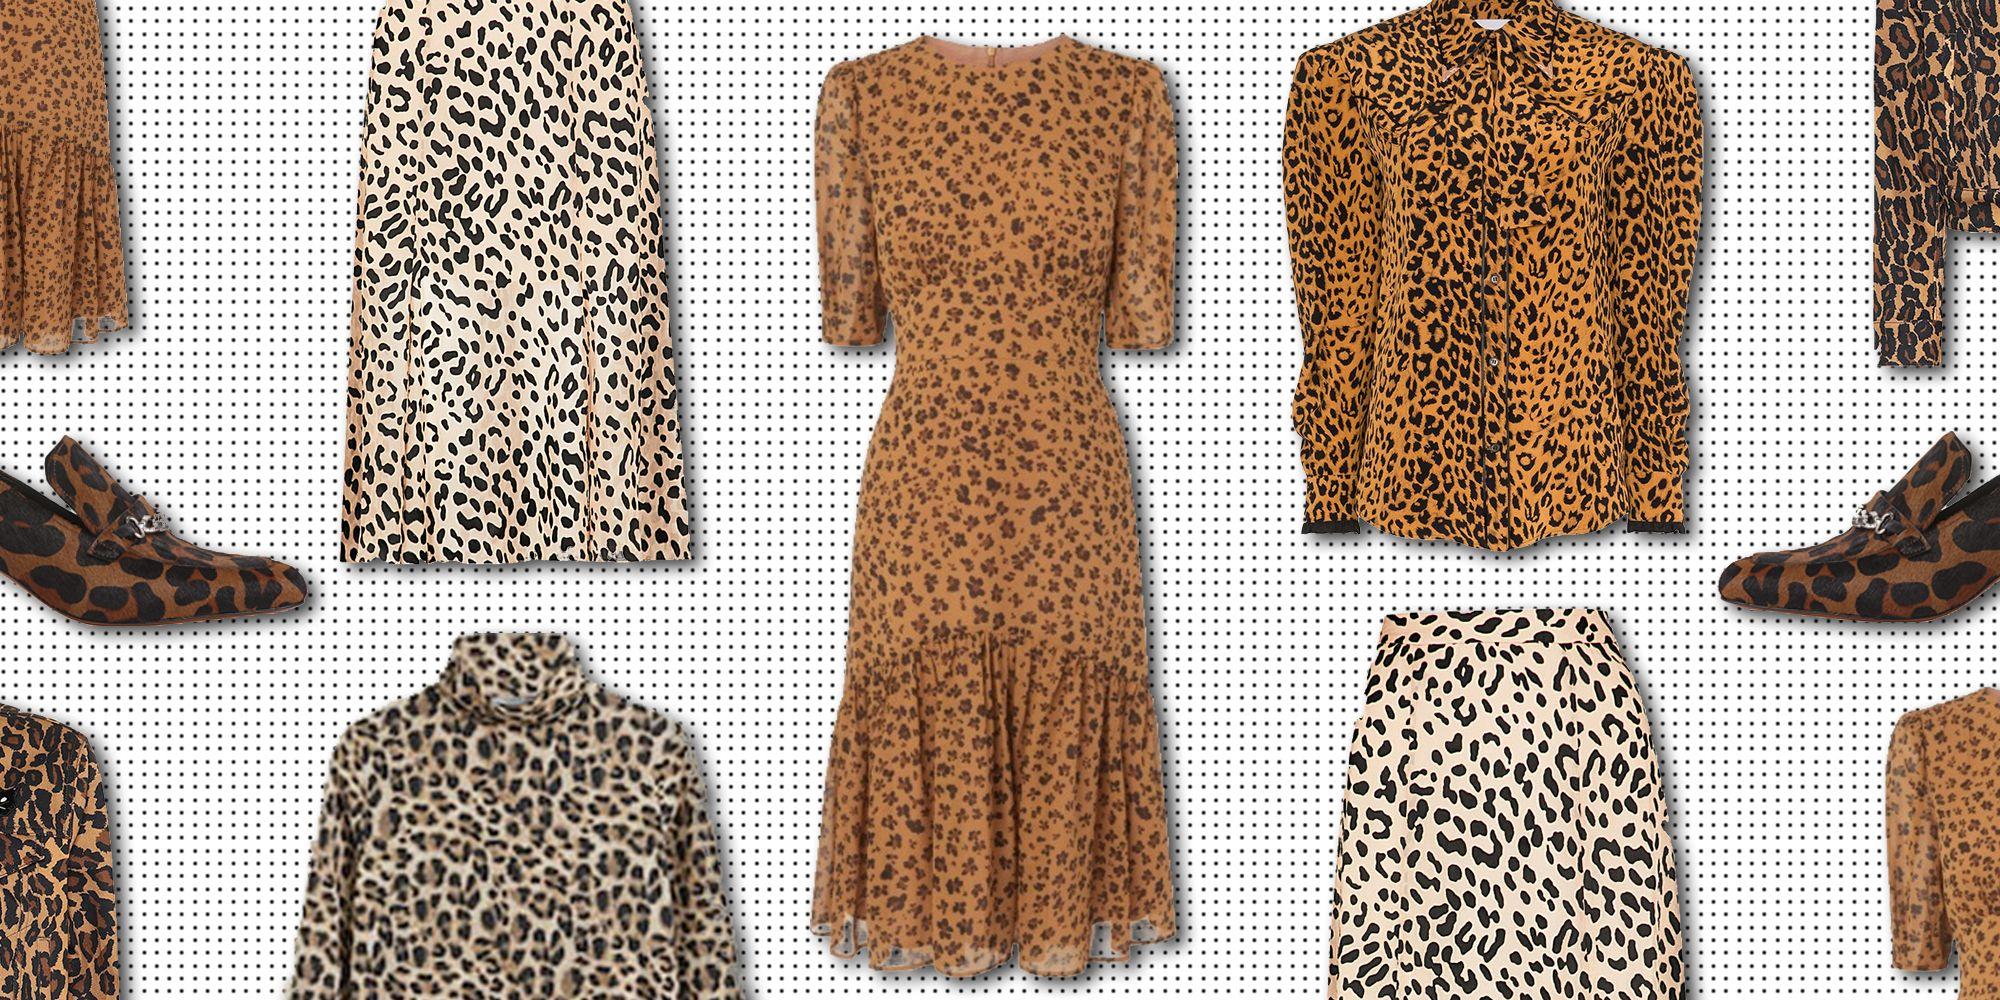 Leopard print fashion - leopard print shopping